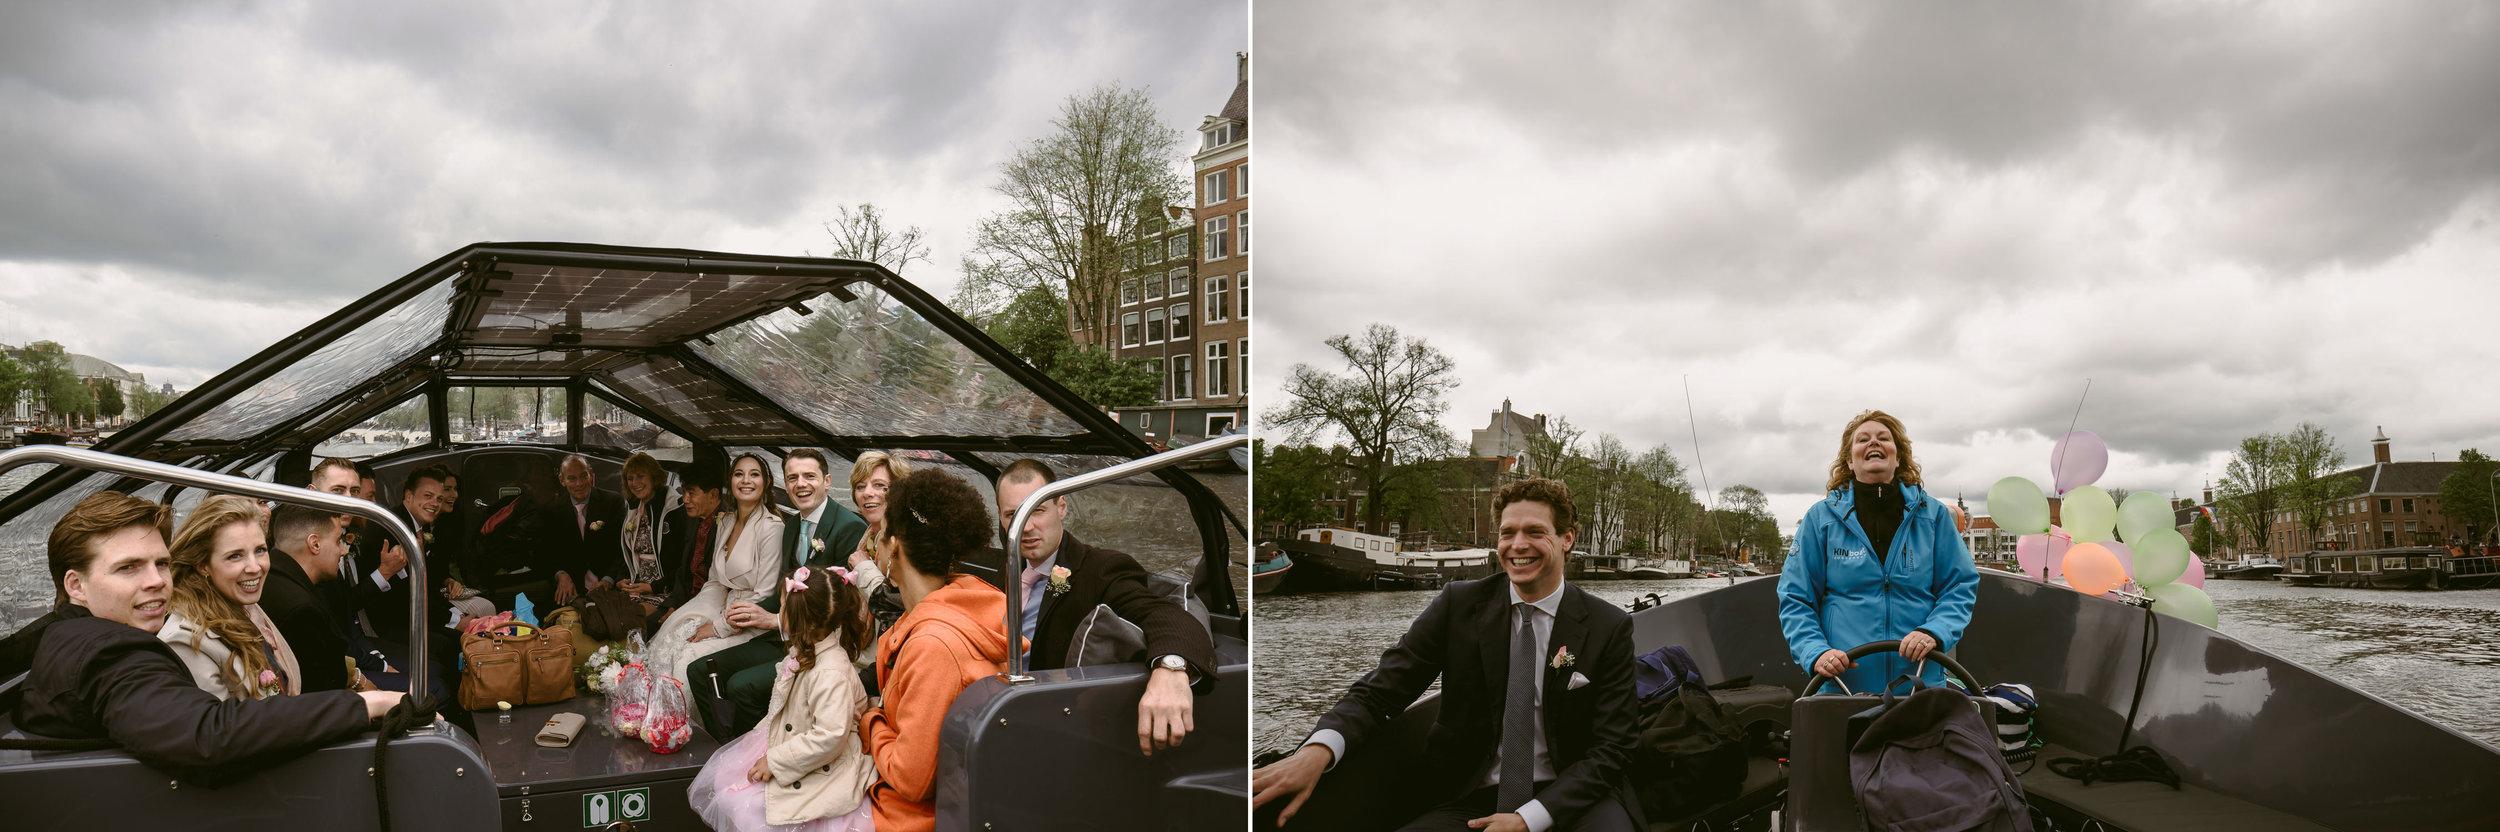 bruidsfotografie-amsterdam-utrecht-trouwfotograaf-mark-hadden-wedding-photography-Robin & Guus-116 copy.jpg